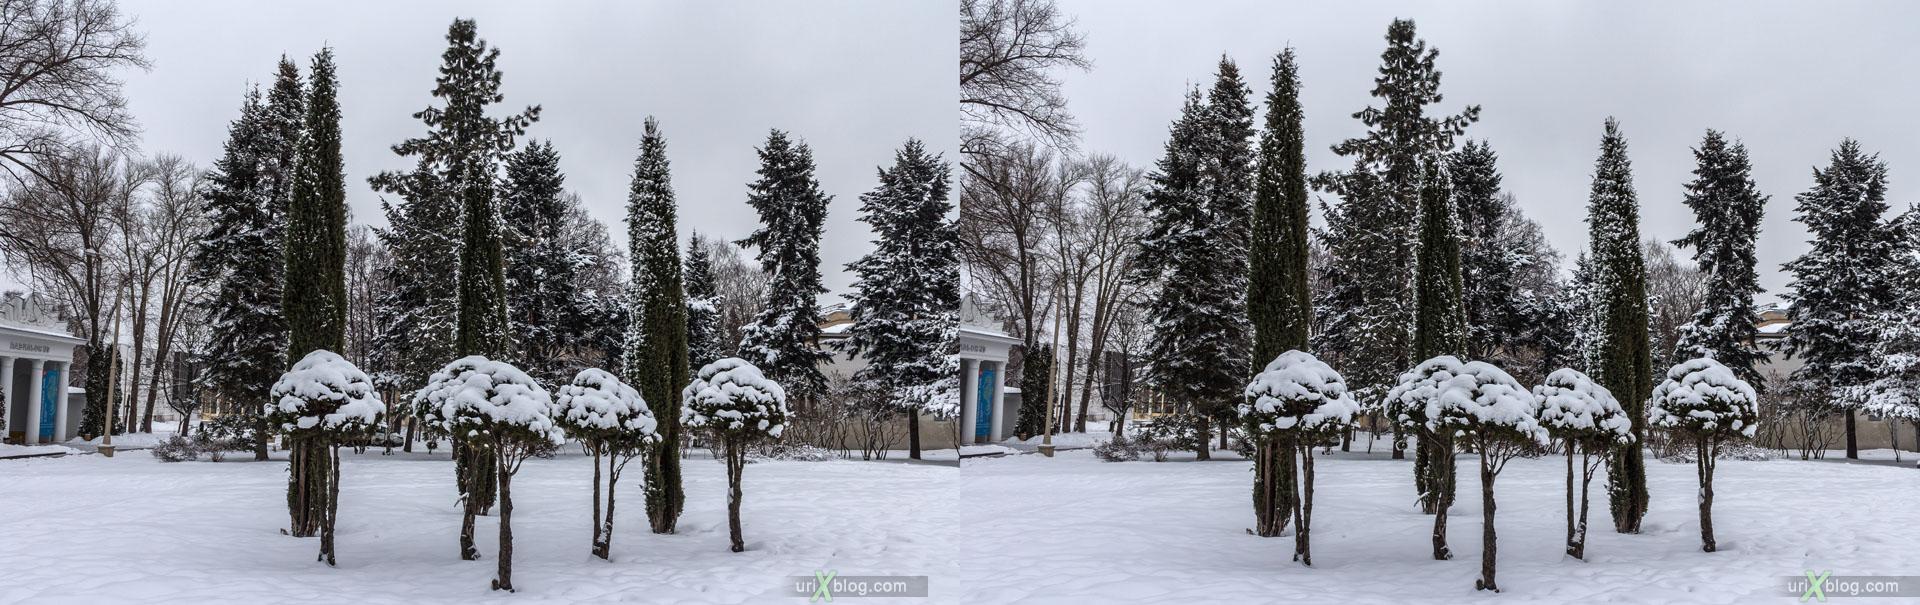 ВДНХ, ВВЦ, парк, зима, снег, Москва, Россия, 3D, перекрёстная стереопара, стерео, стереопара, 2015